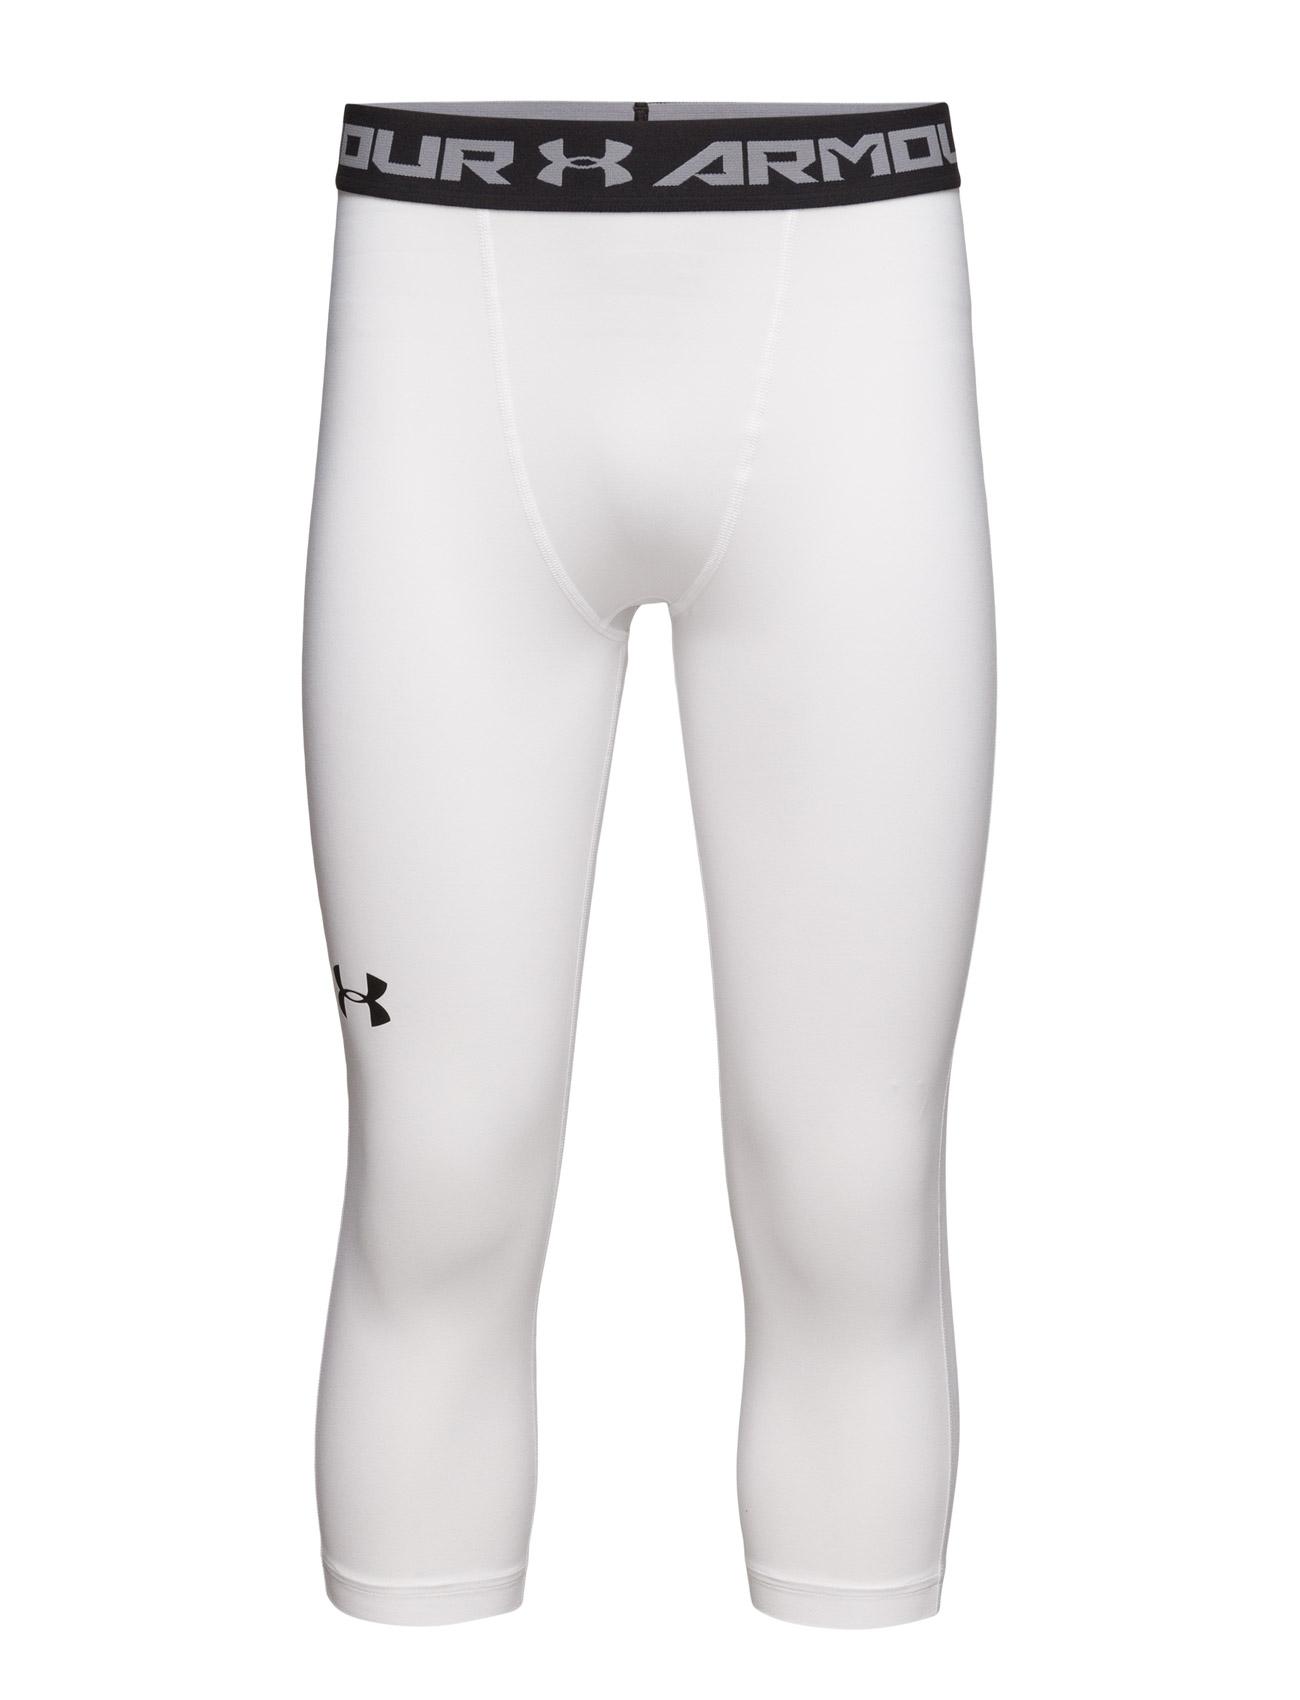 Armour Hg 3/4 Comp Legging Under Armour Sportstøj til Herrer i Sort